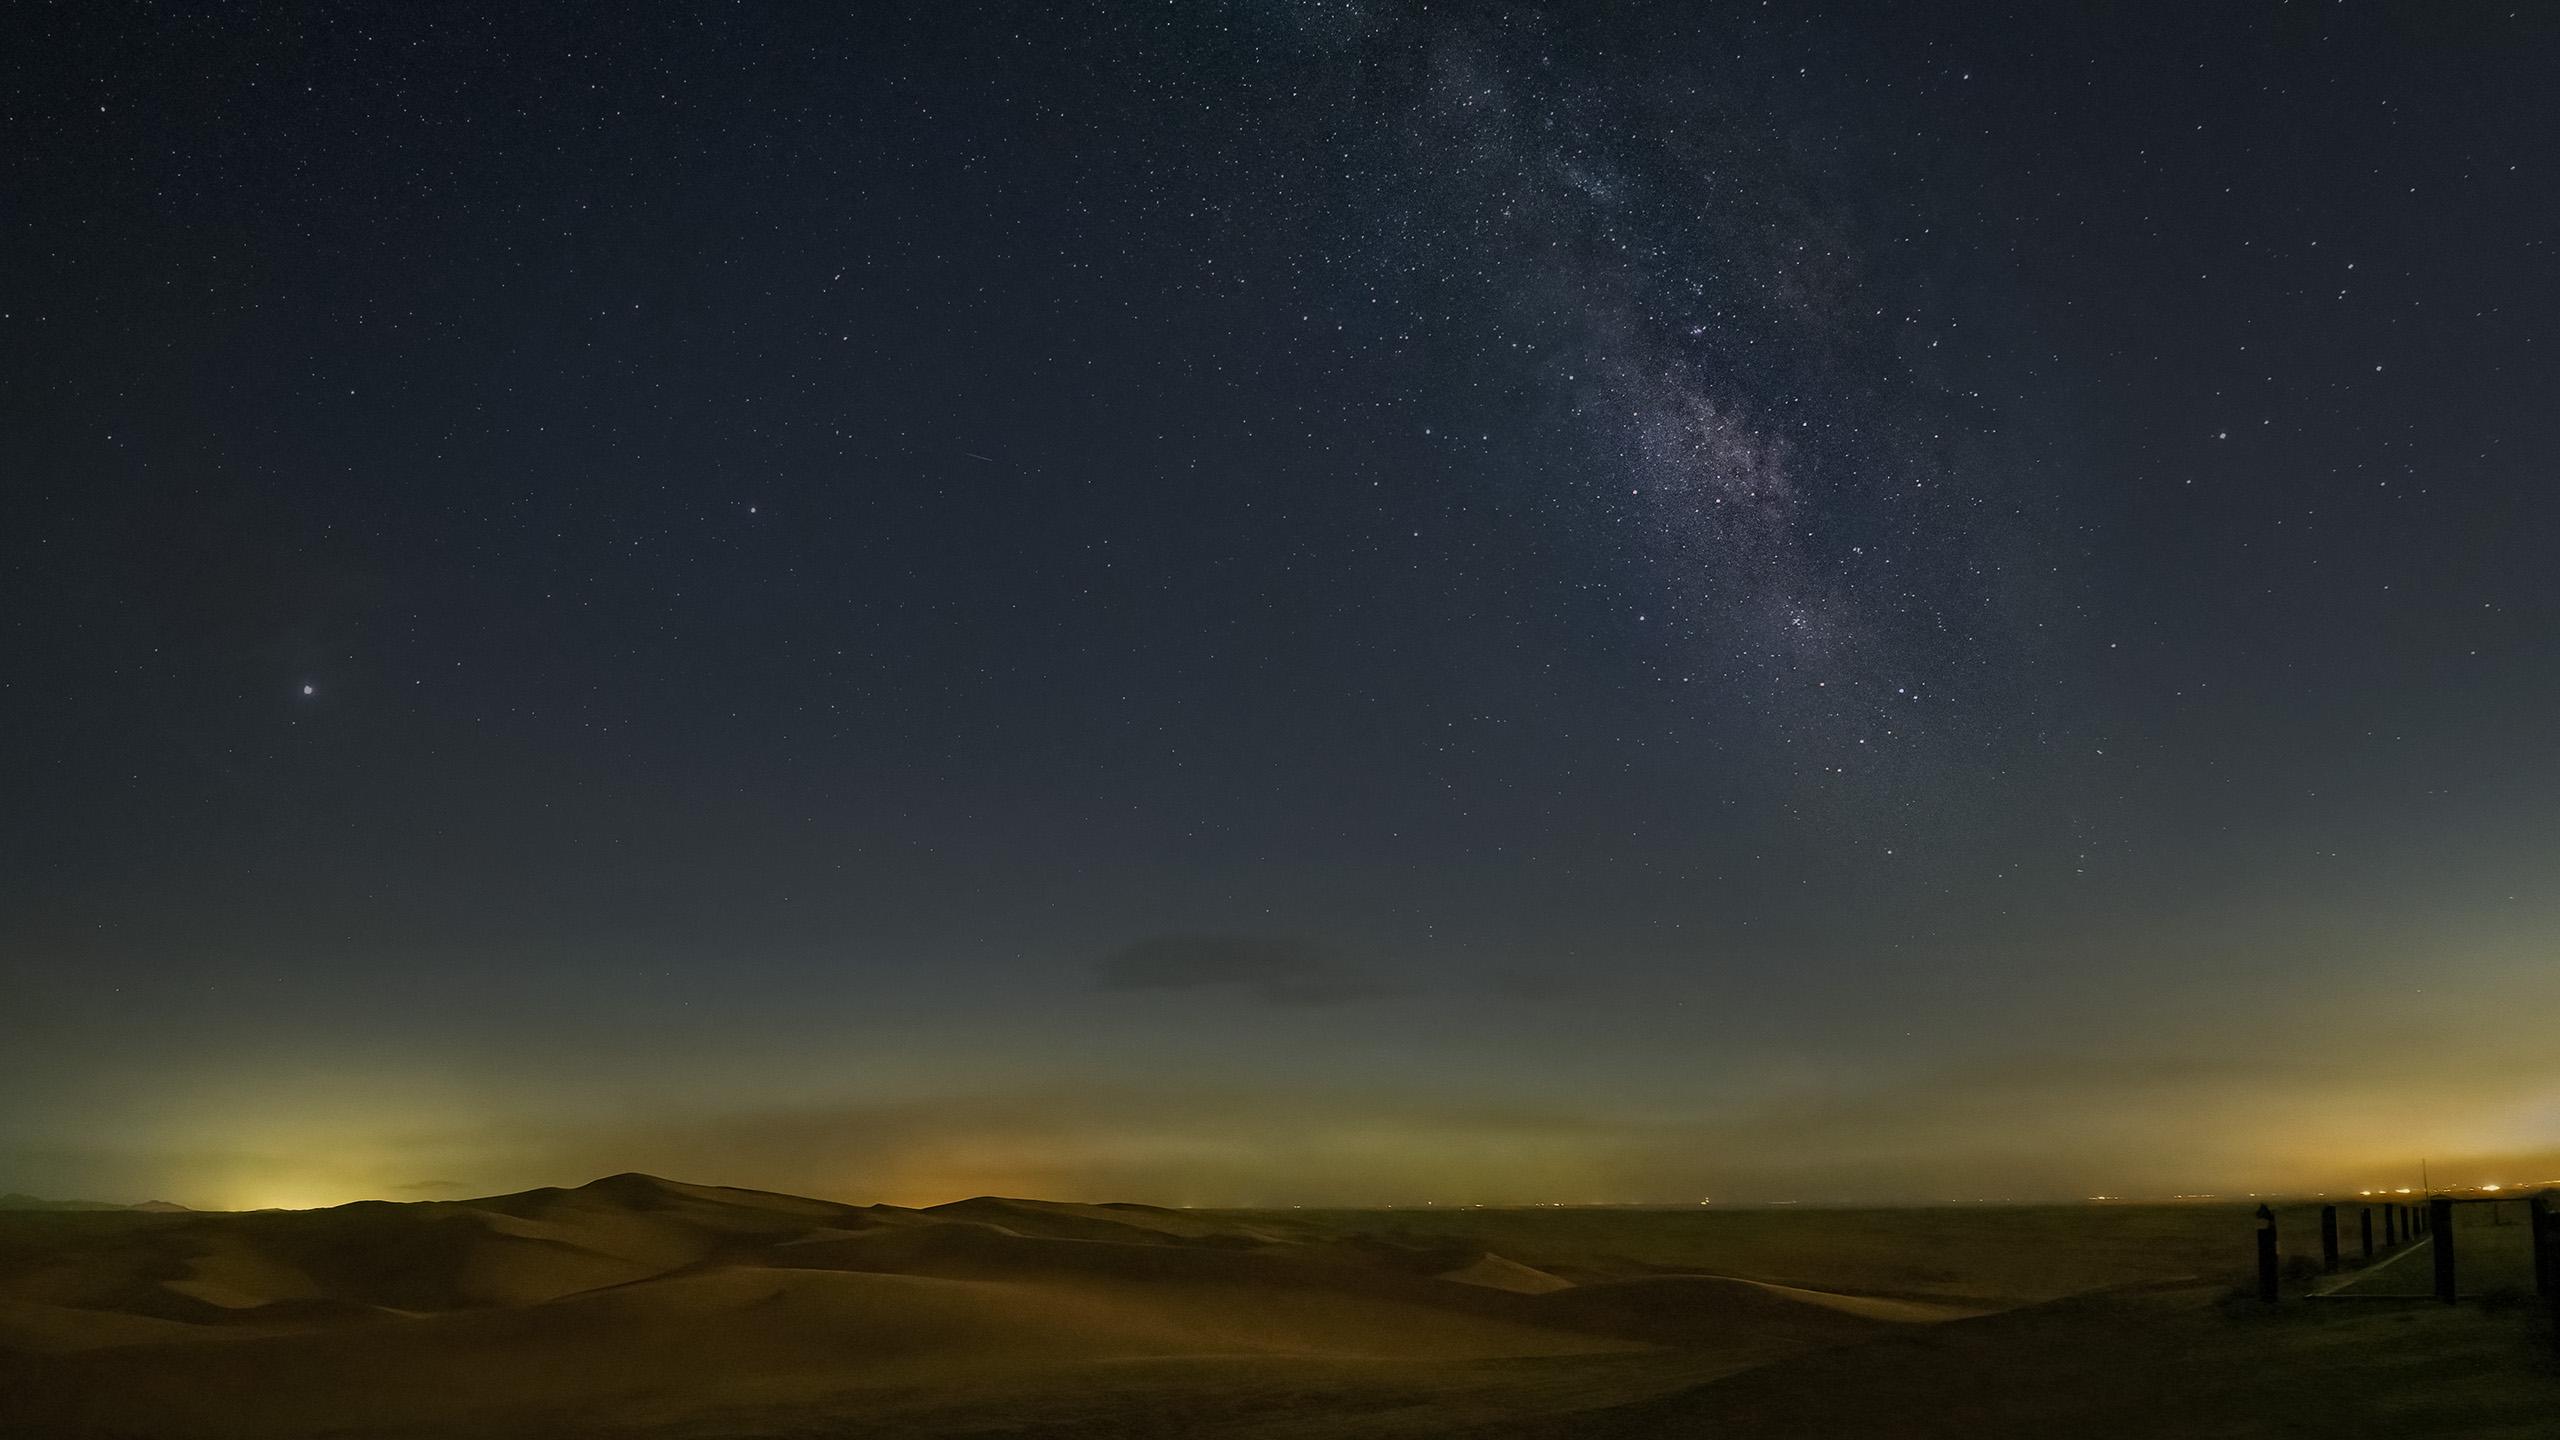 imperial_MW_sky_desert_P8120880_2560p